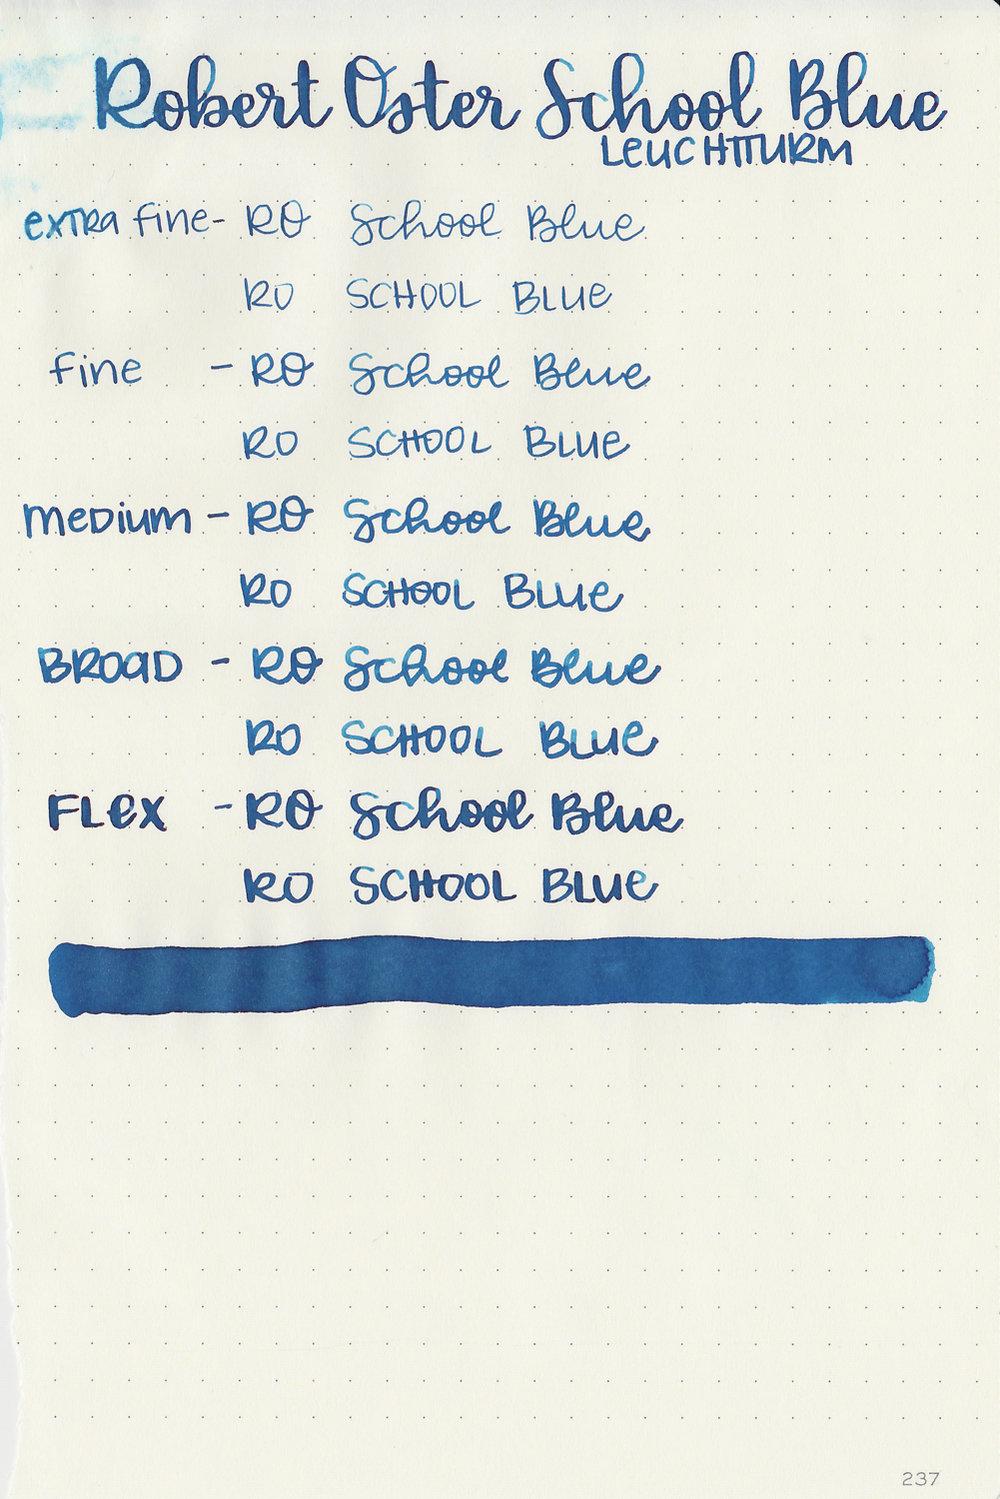 ro-school-blue-9.jpg